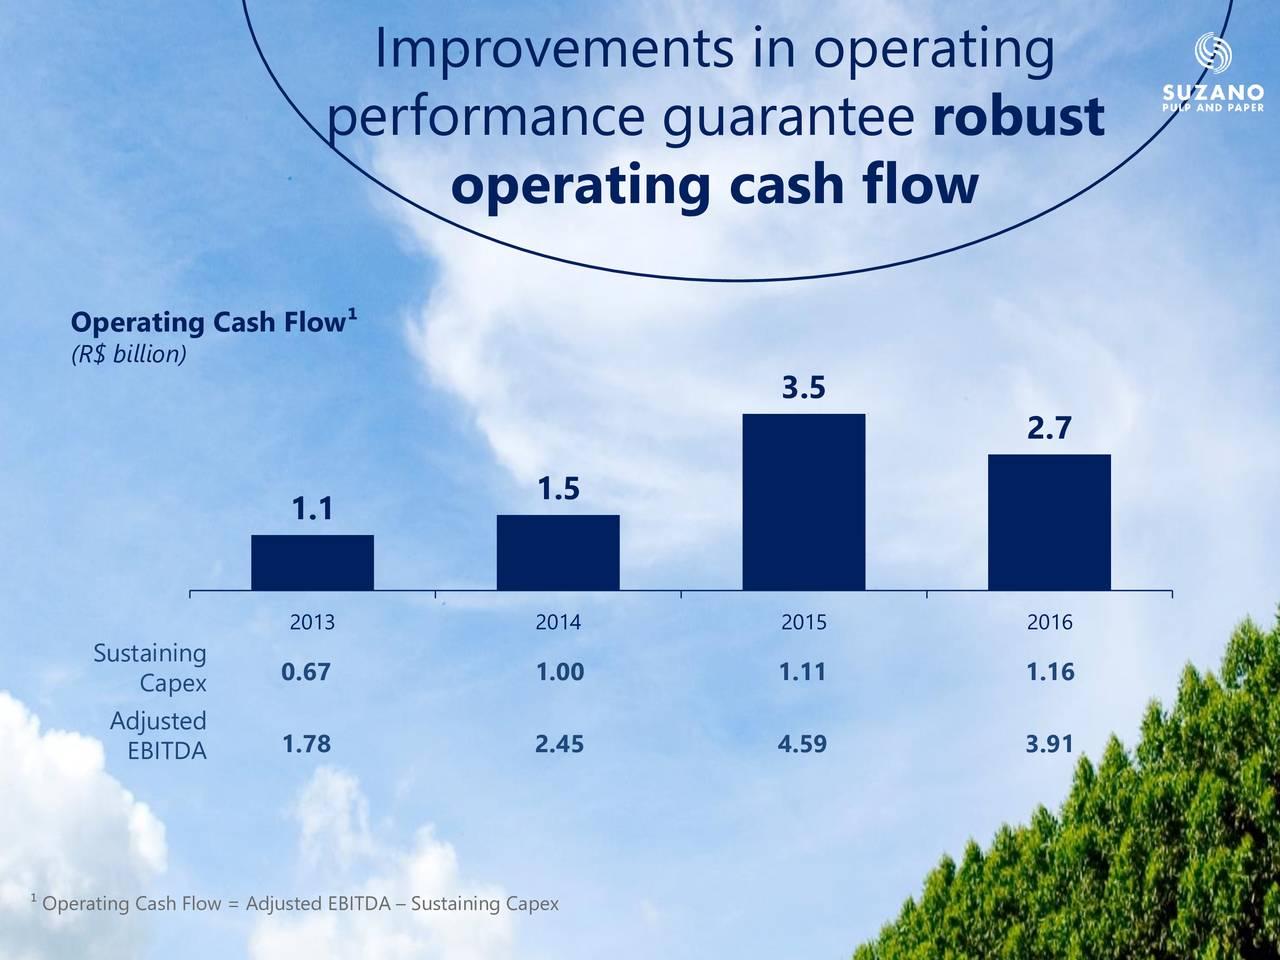 performance guarantee robust operating cash flow Operating Cash Flow (R$ billion) 3.5 2.7 1.5 1.1 2013 2014 2015 2016 Sustaining 0.67 1.00 1.11 1.16 Capex Adjusted EBITDA 1.78 2.45 4.59 3.91 Operating Cash Flow = Adjusted EBITDA  Sustaining Capex